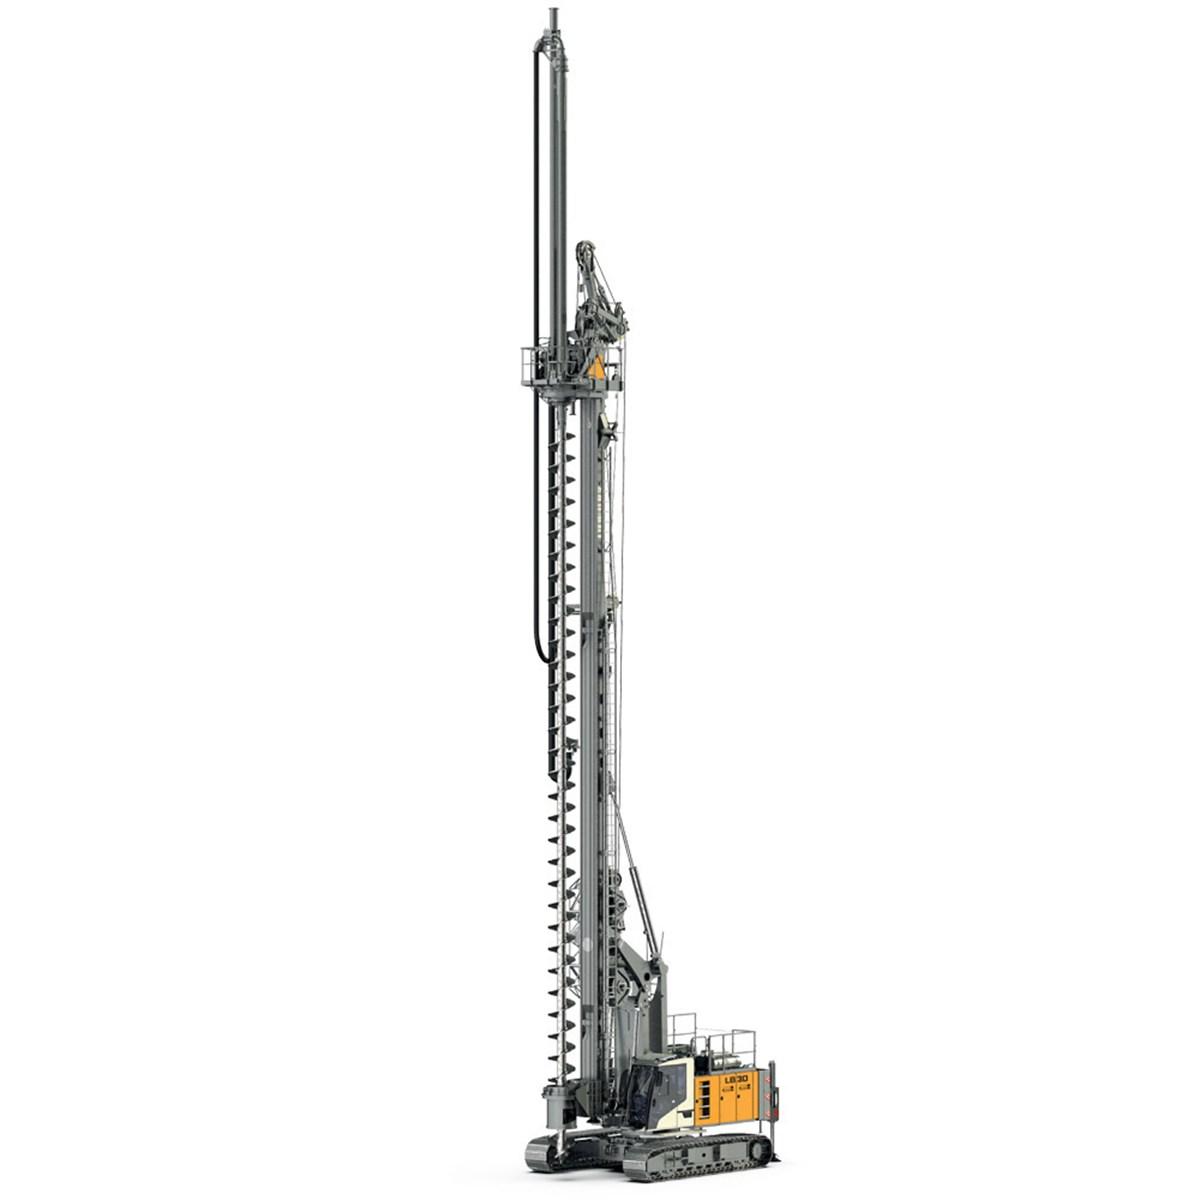 liebherr-lb-30-drilling-rig-drehbohrgerat-sob-endlosschnecke-auger-drilling-1.jpg